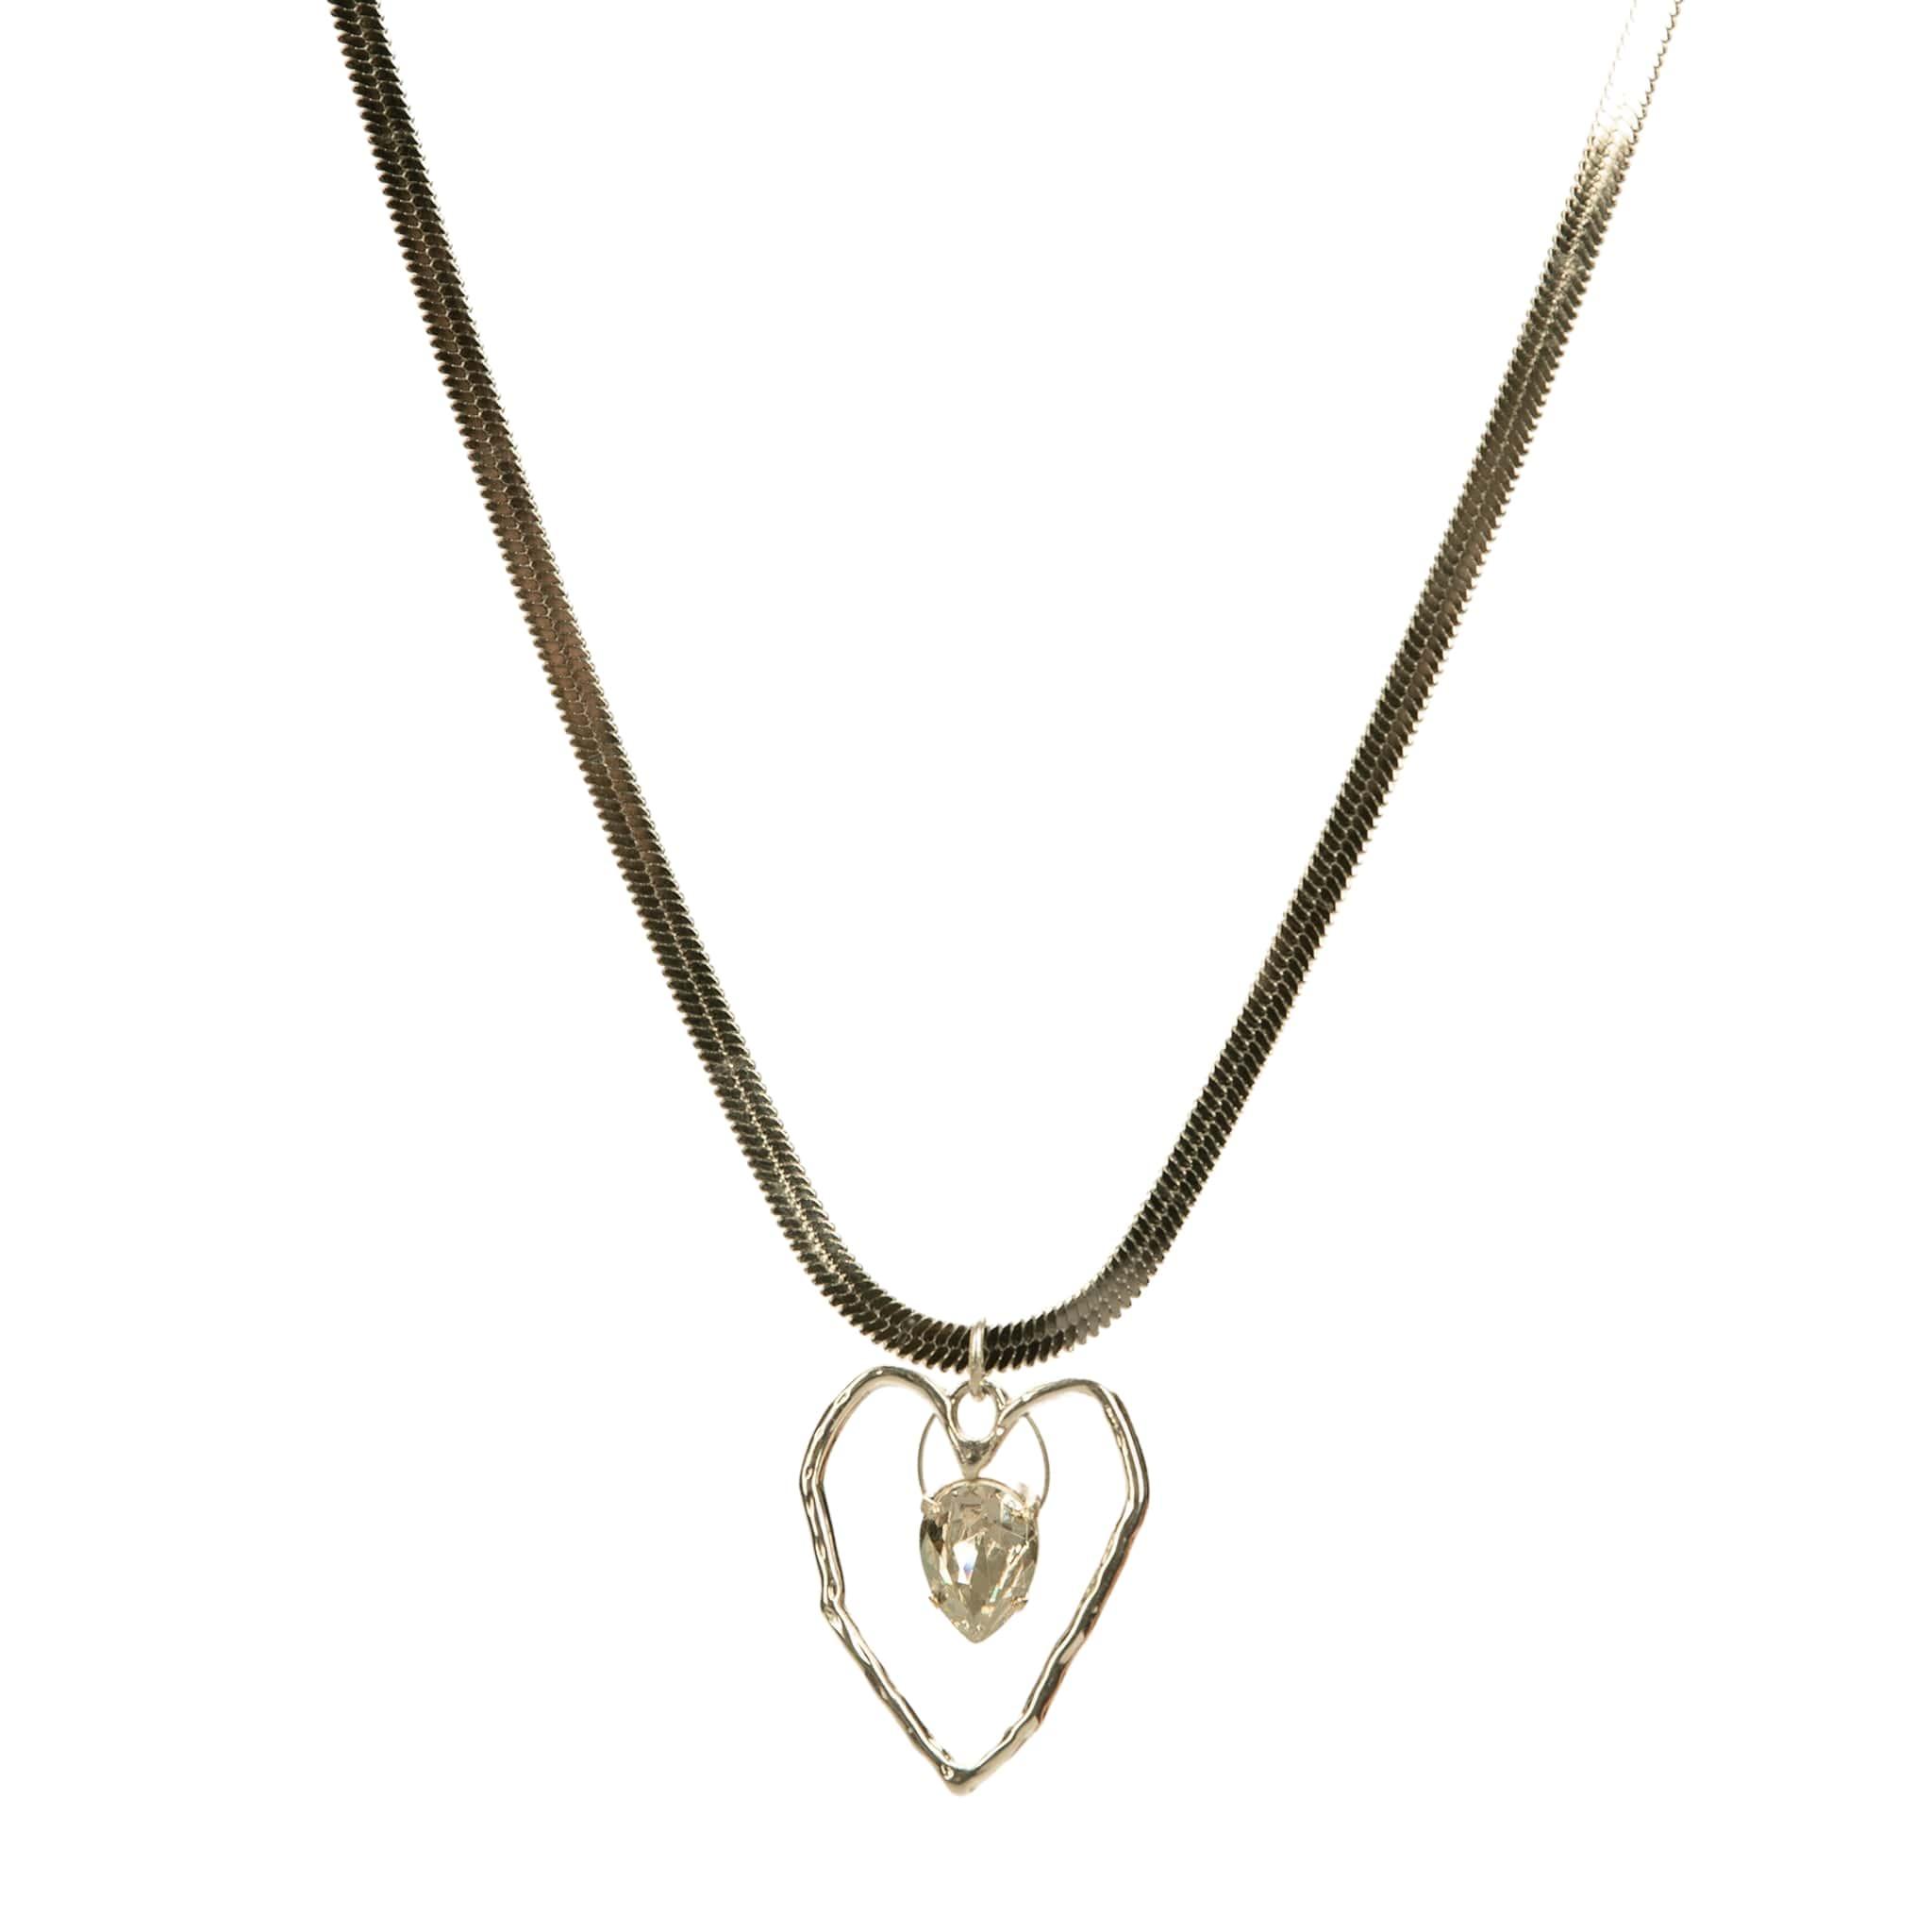 Swarovski Κολιέ με Κρύσταλο Μέσα σε Καρδιά